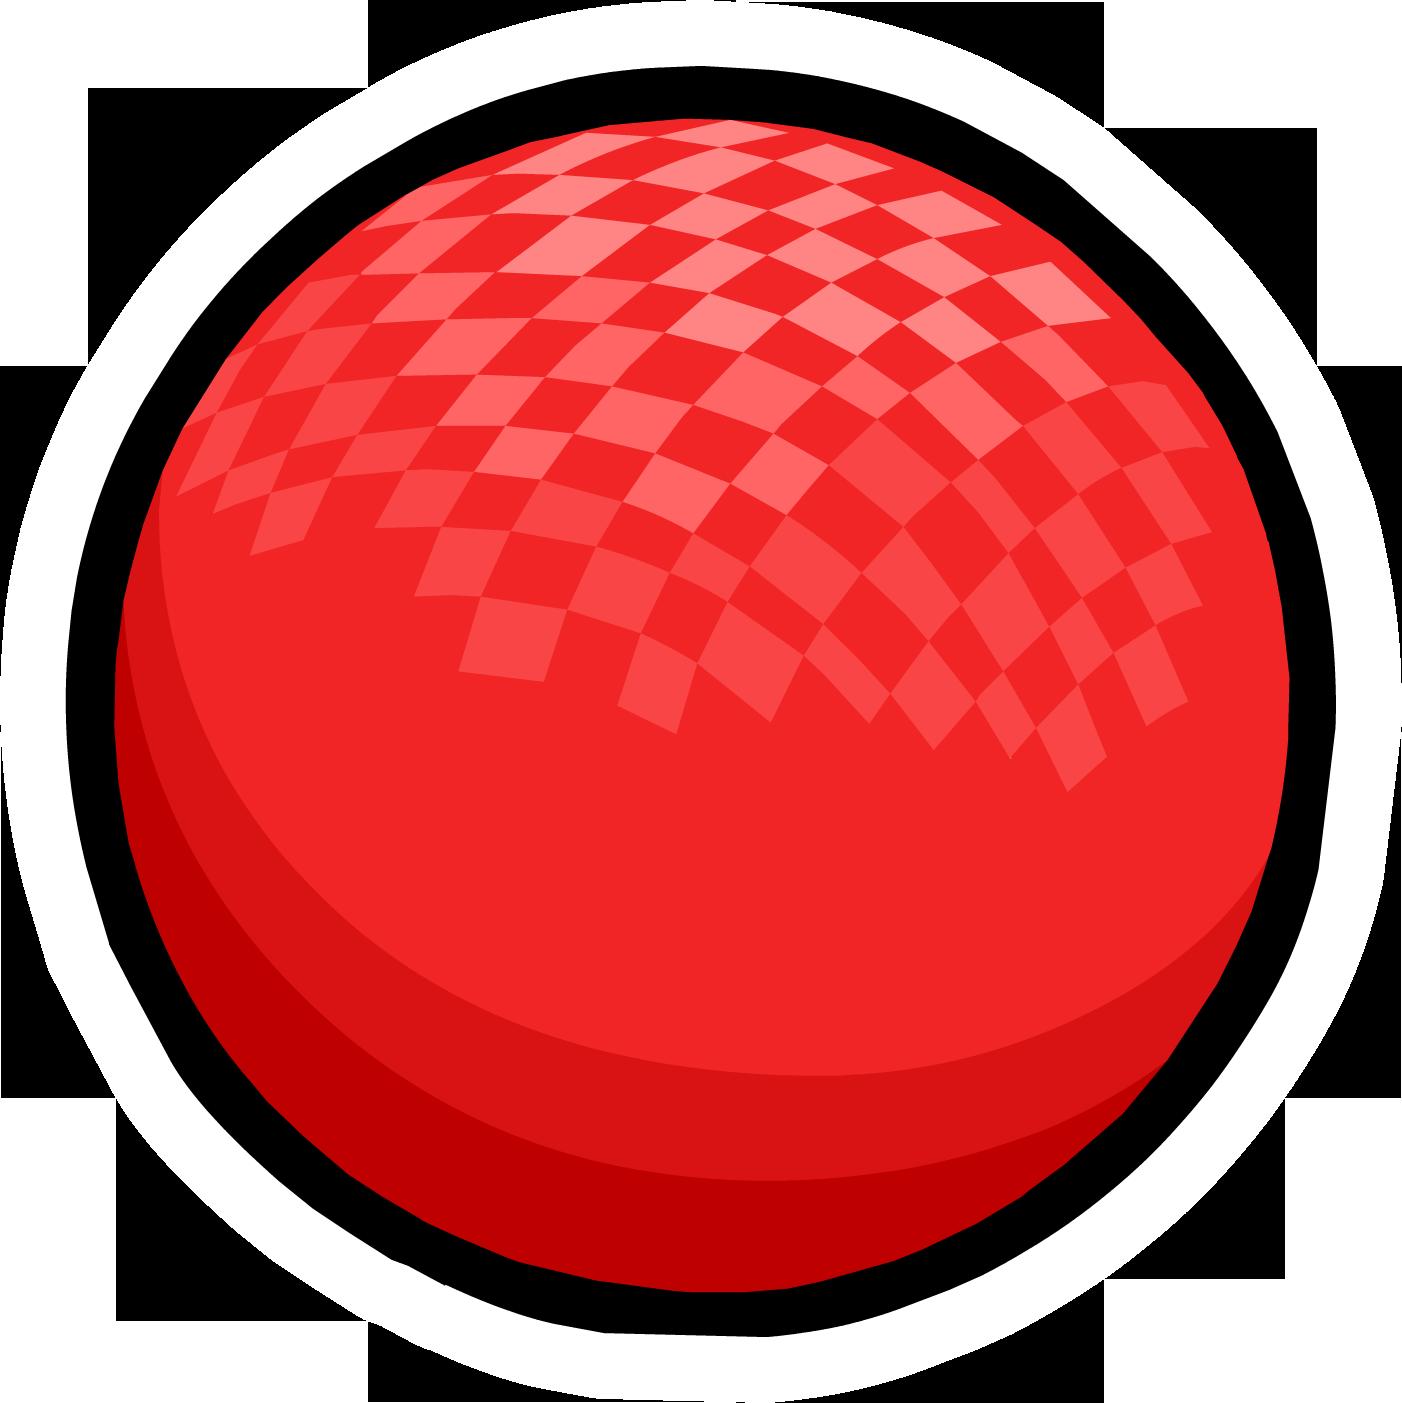 dodge ball clip art cliparts co Dodgeball Logos Dodgeball Graphics Background